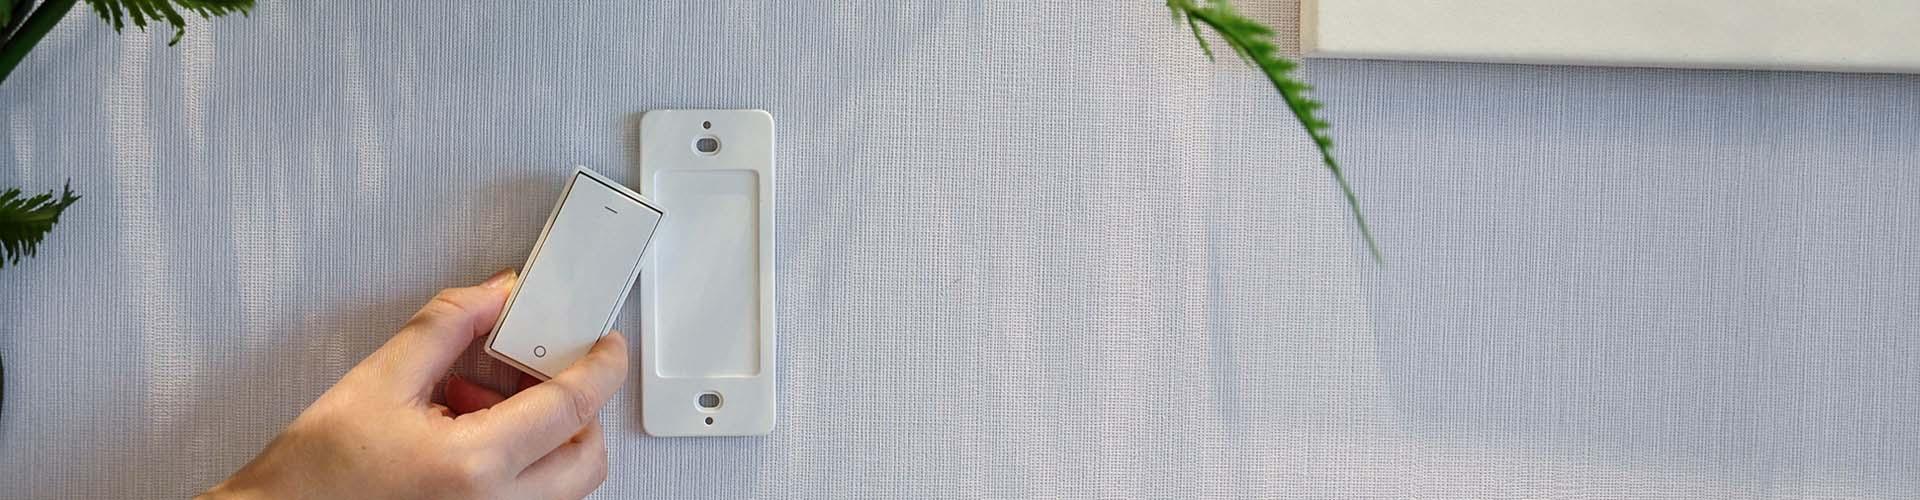 U1 American standard magnetic self-powered switch